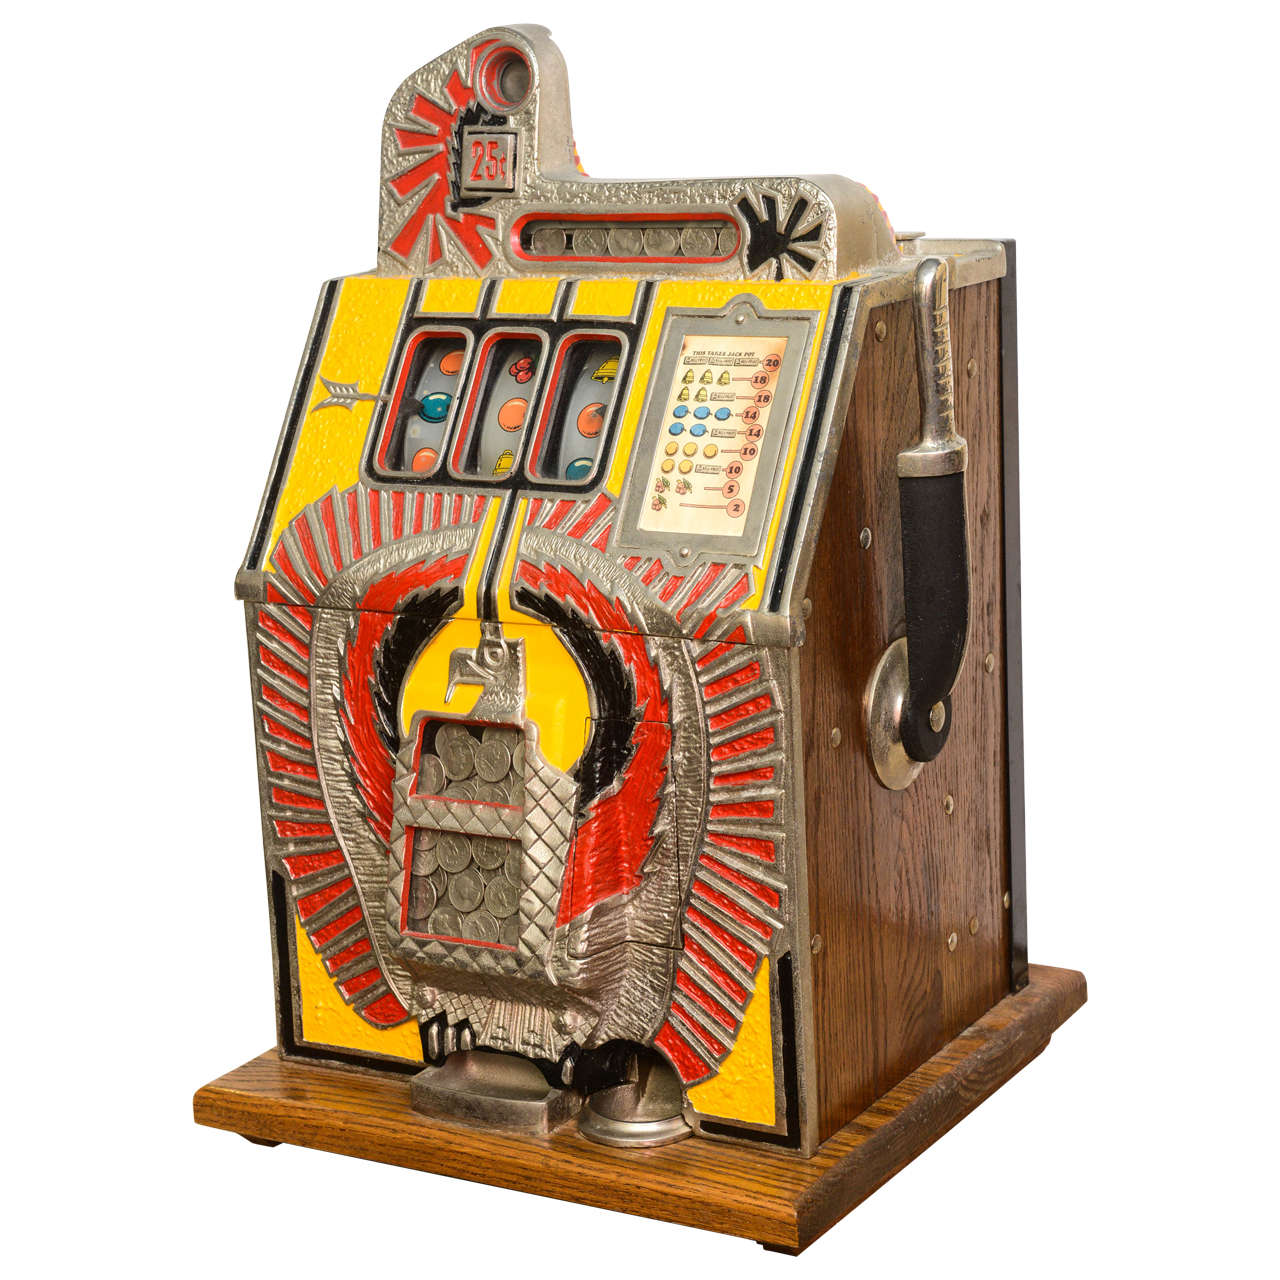 25 Cent Furniture 25 Cent Bronze Chief Slot Machine At 1stdibs 25 Cent War Eagle Mills Slot